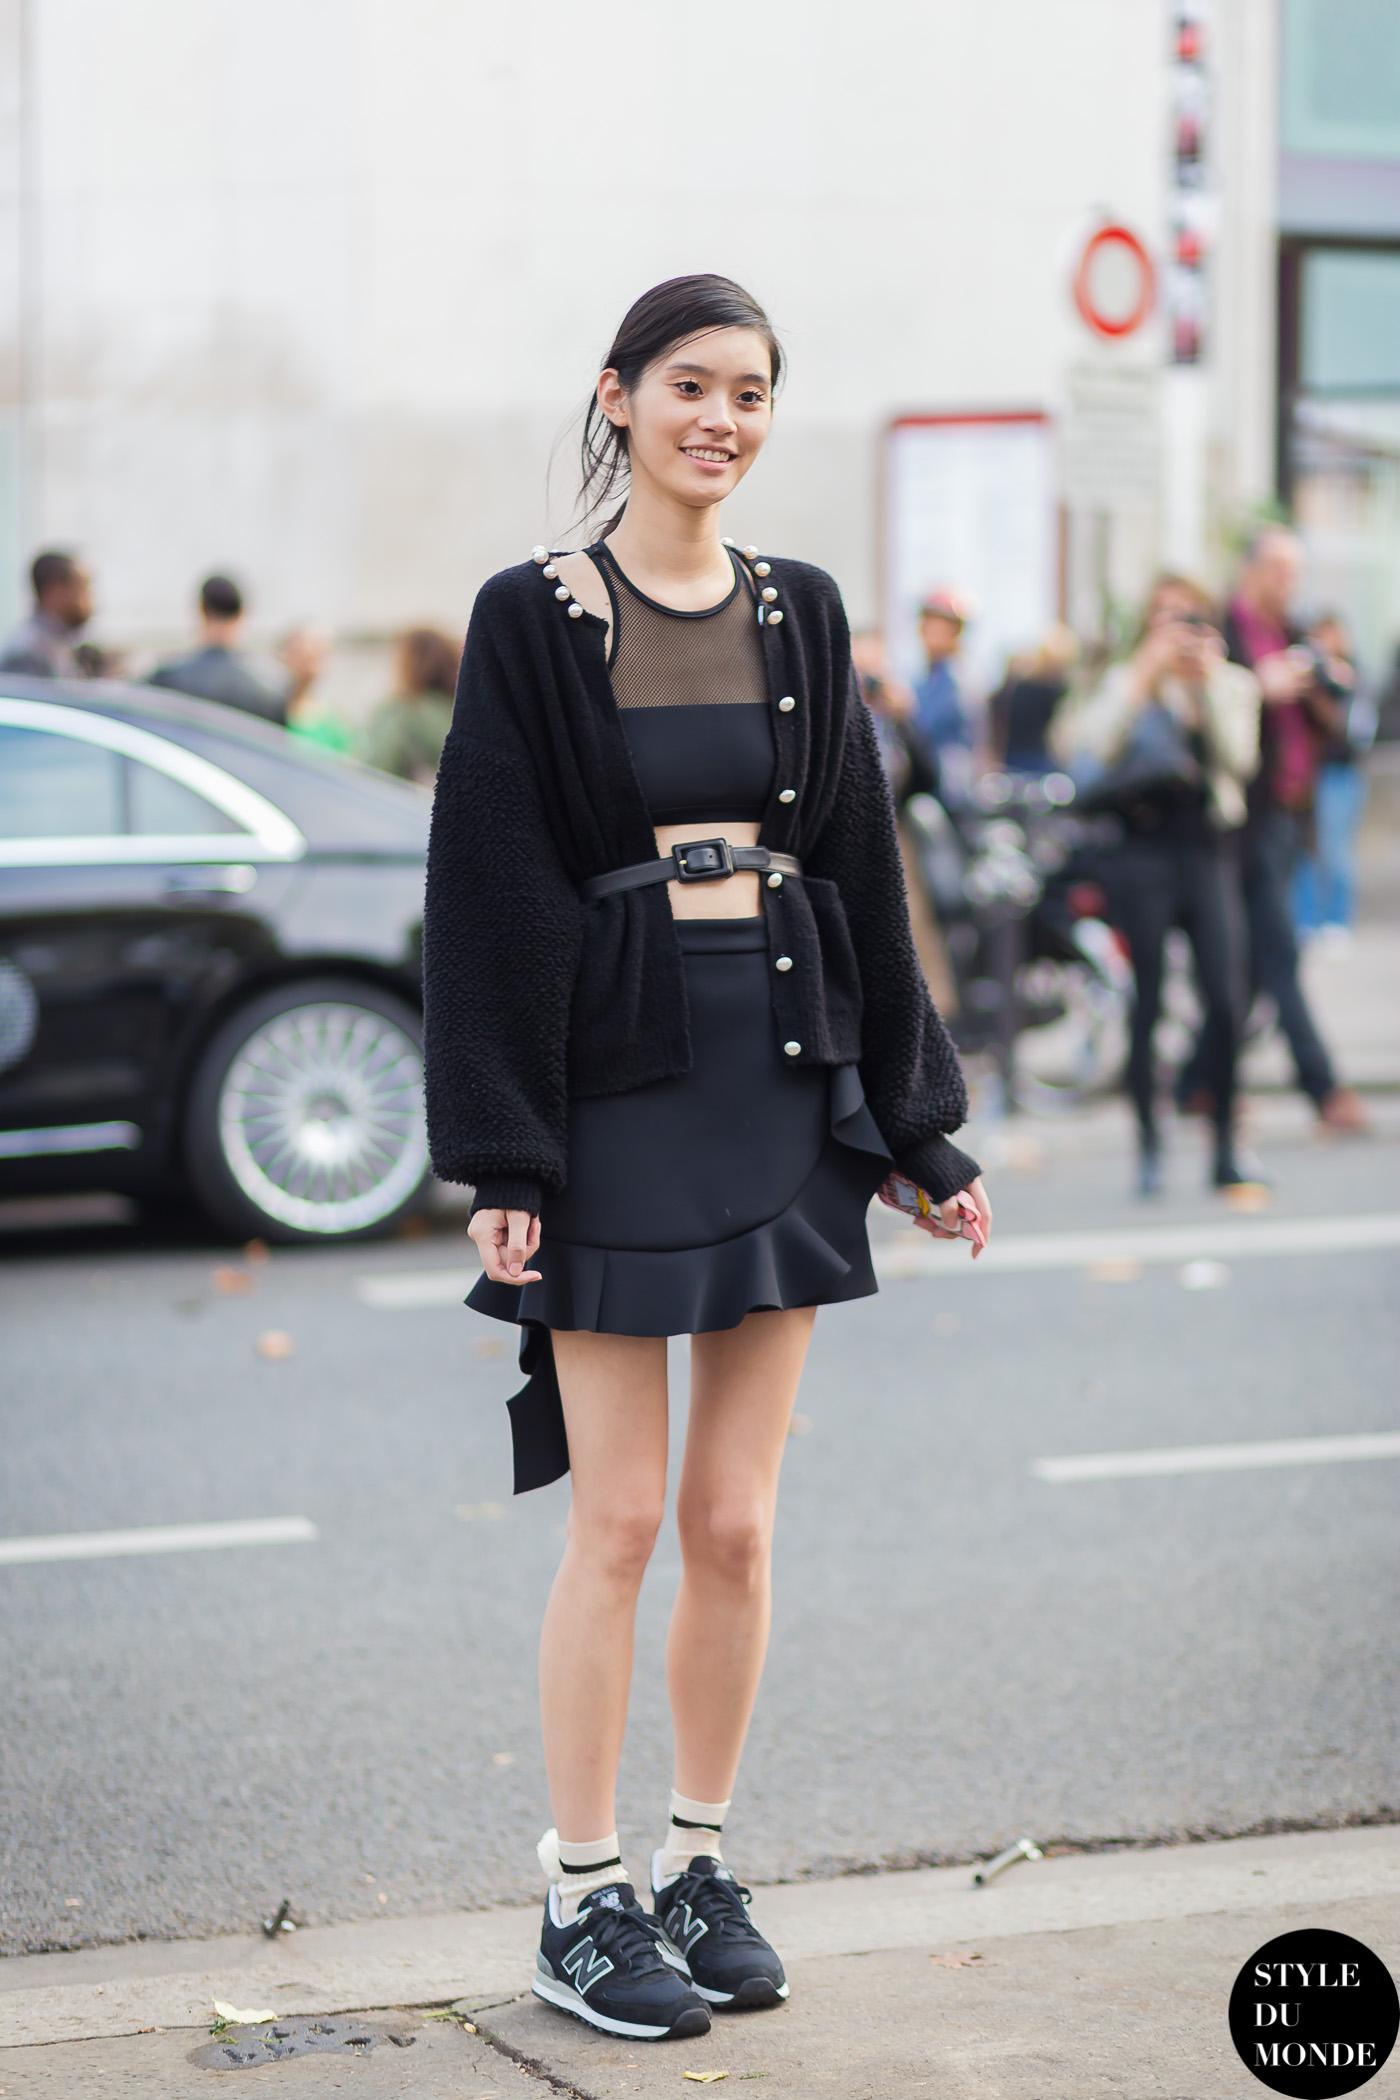 Blackfashion Blog Facebook Puksies Wardrobe Tumblr: Paris FW SS15 Street Style: Ming Xi